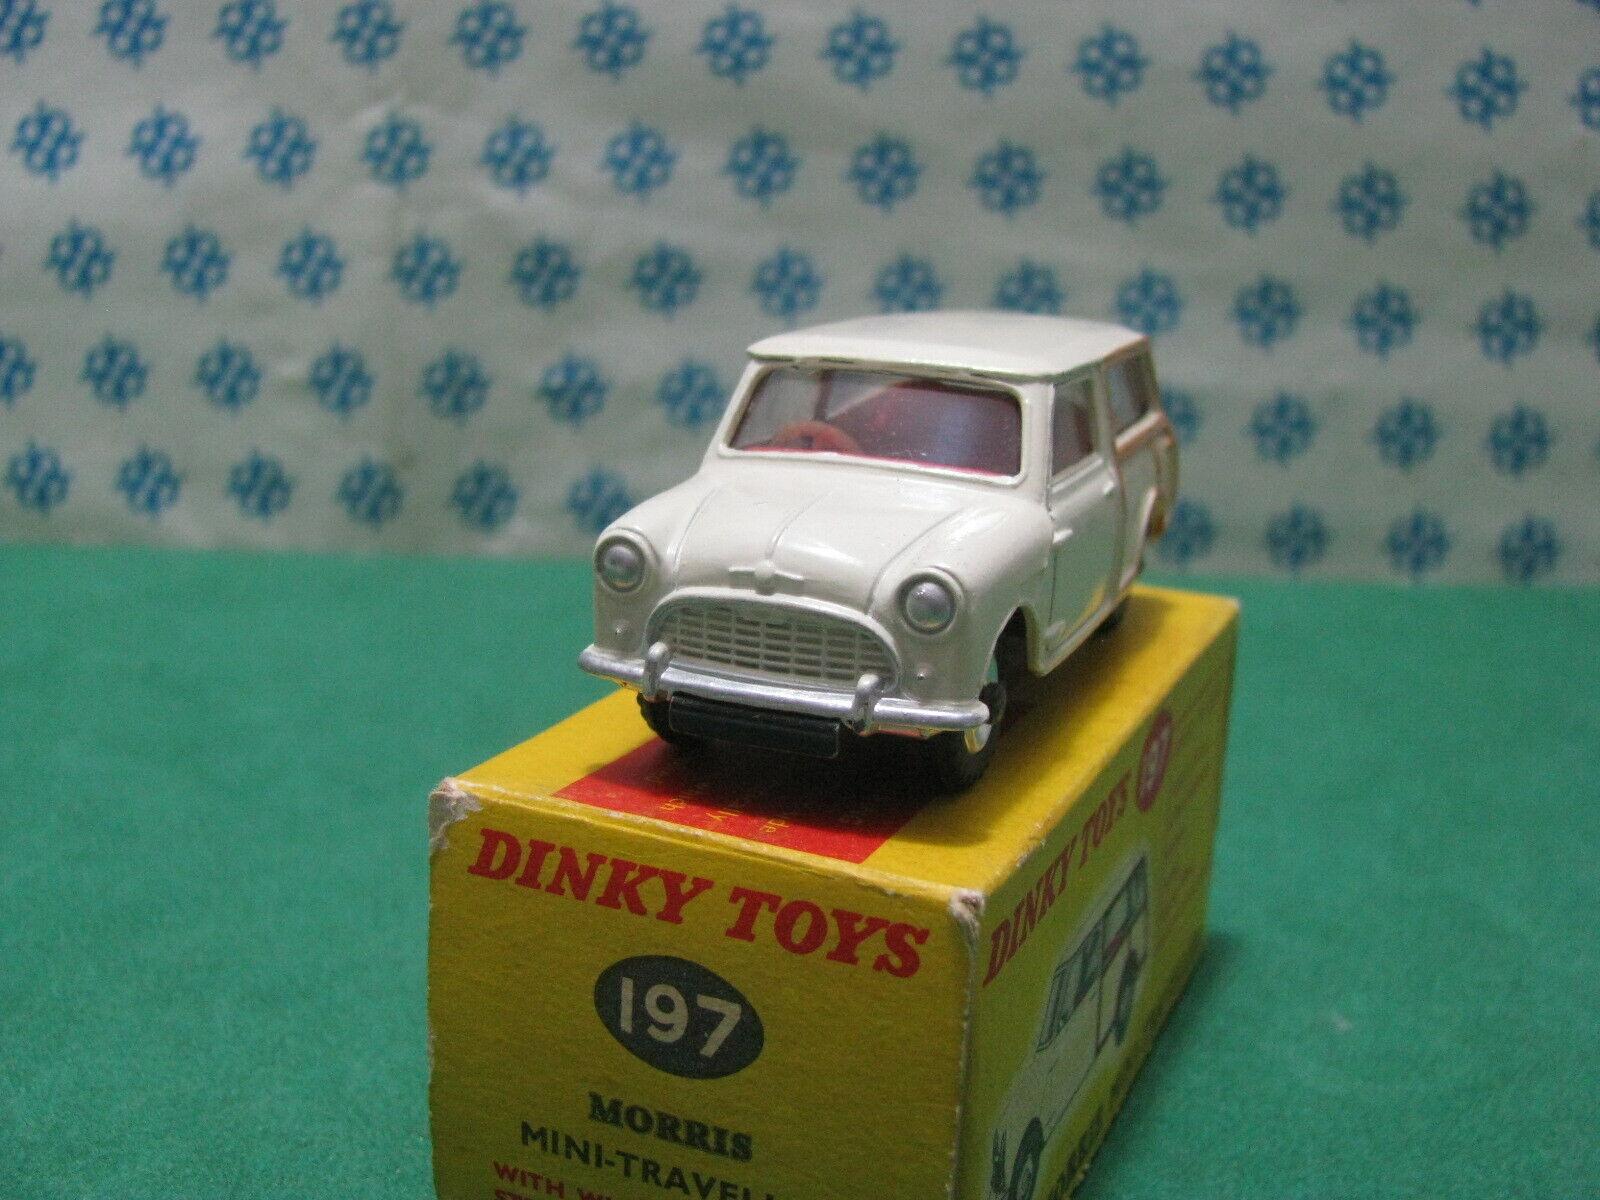 Vintage -  Mini Morris Traveller  - Dinky Juguetes 197  Nuova - Mint in Box